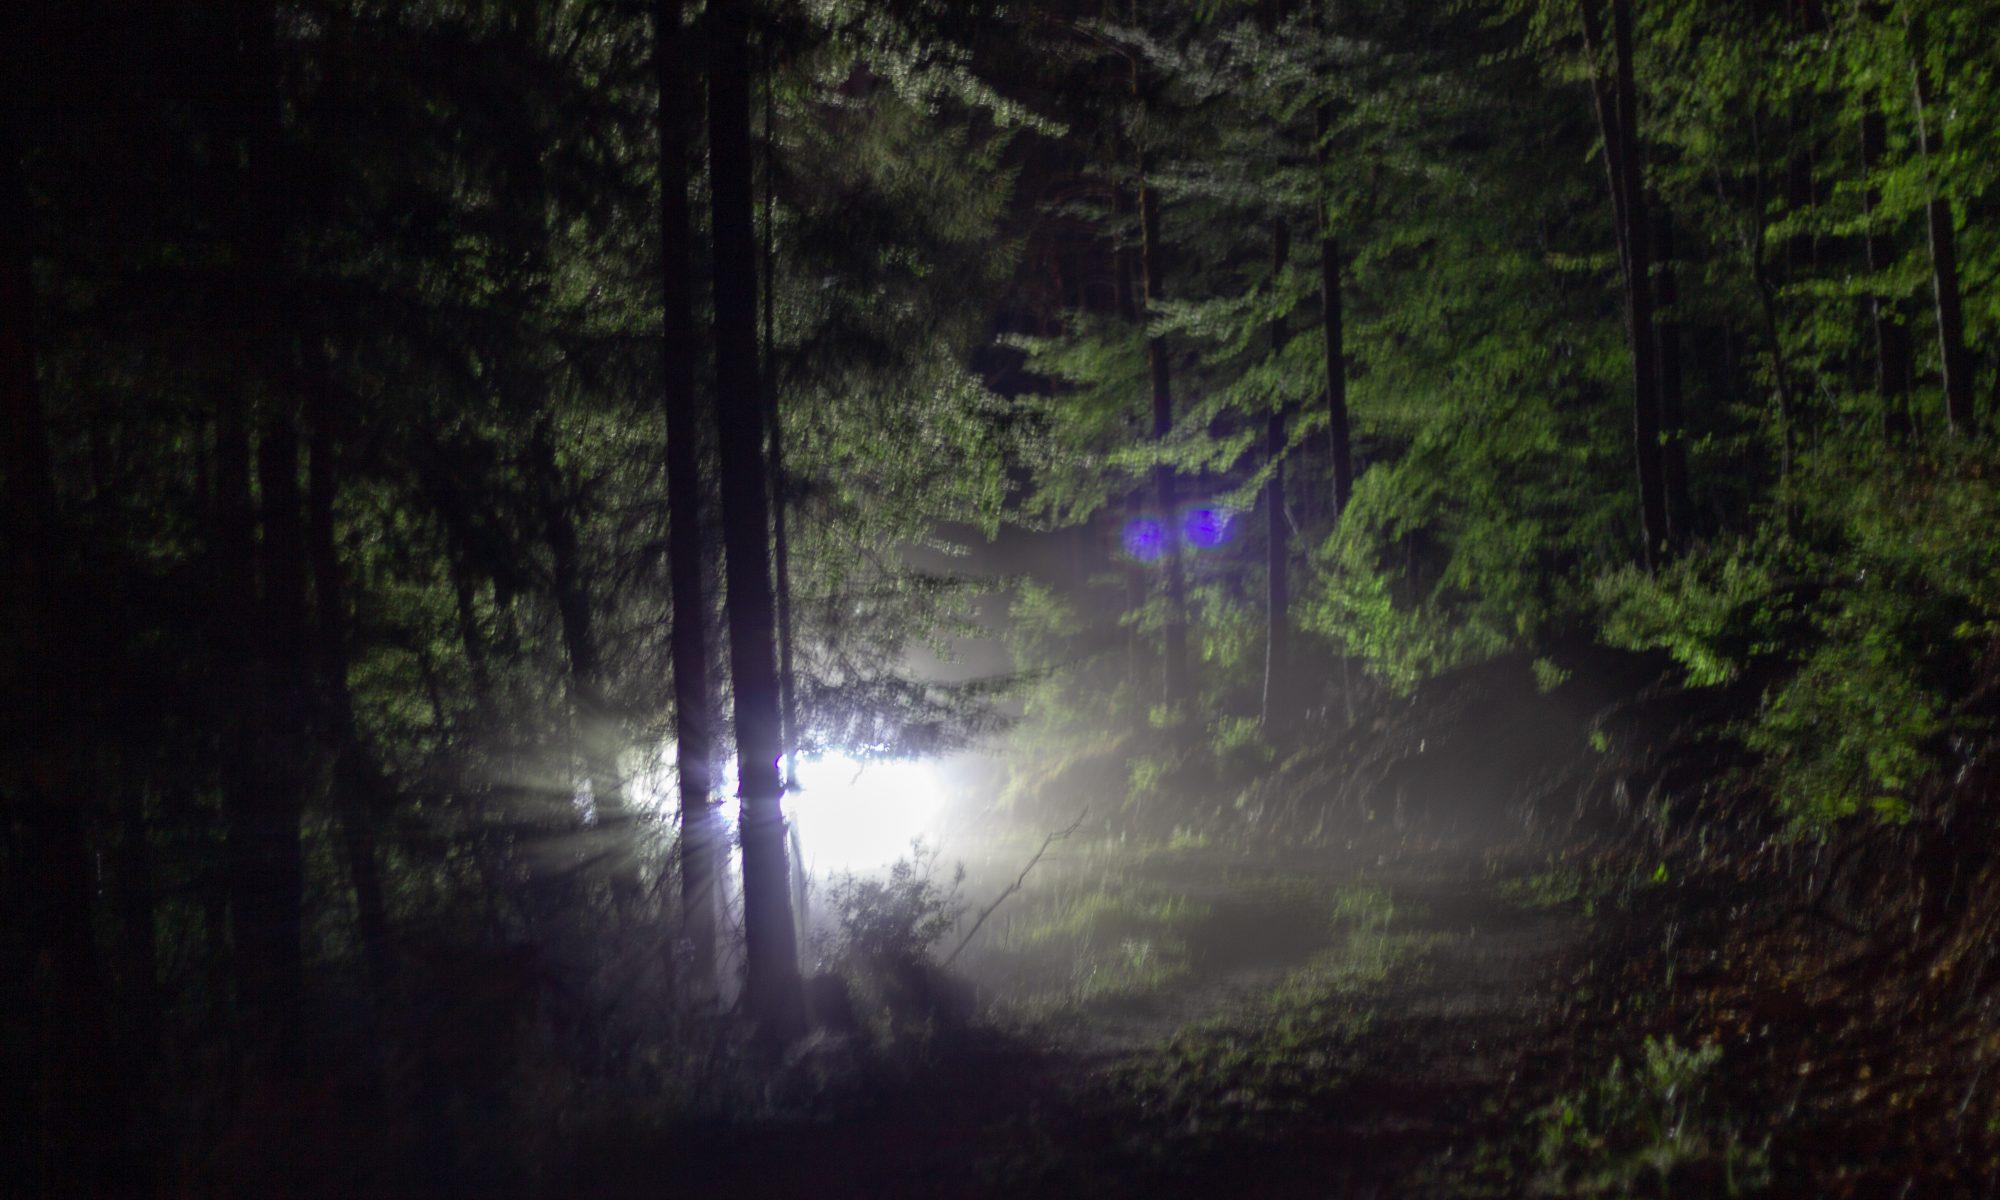 Das Ding da hinten im Wald